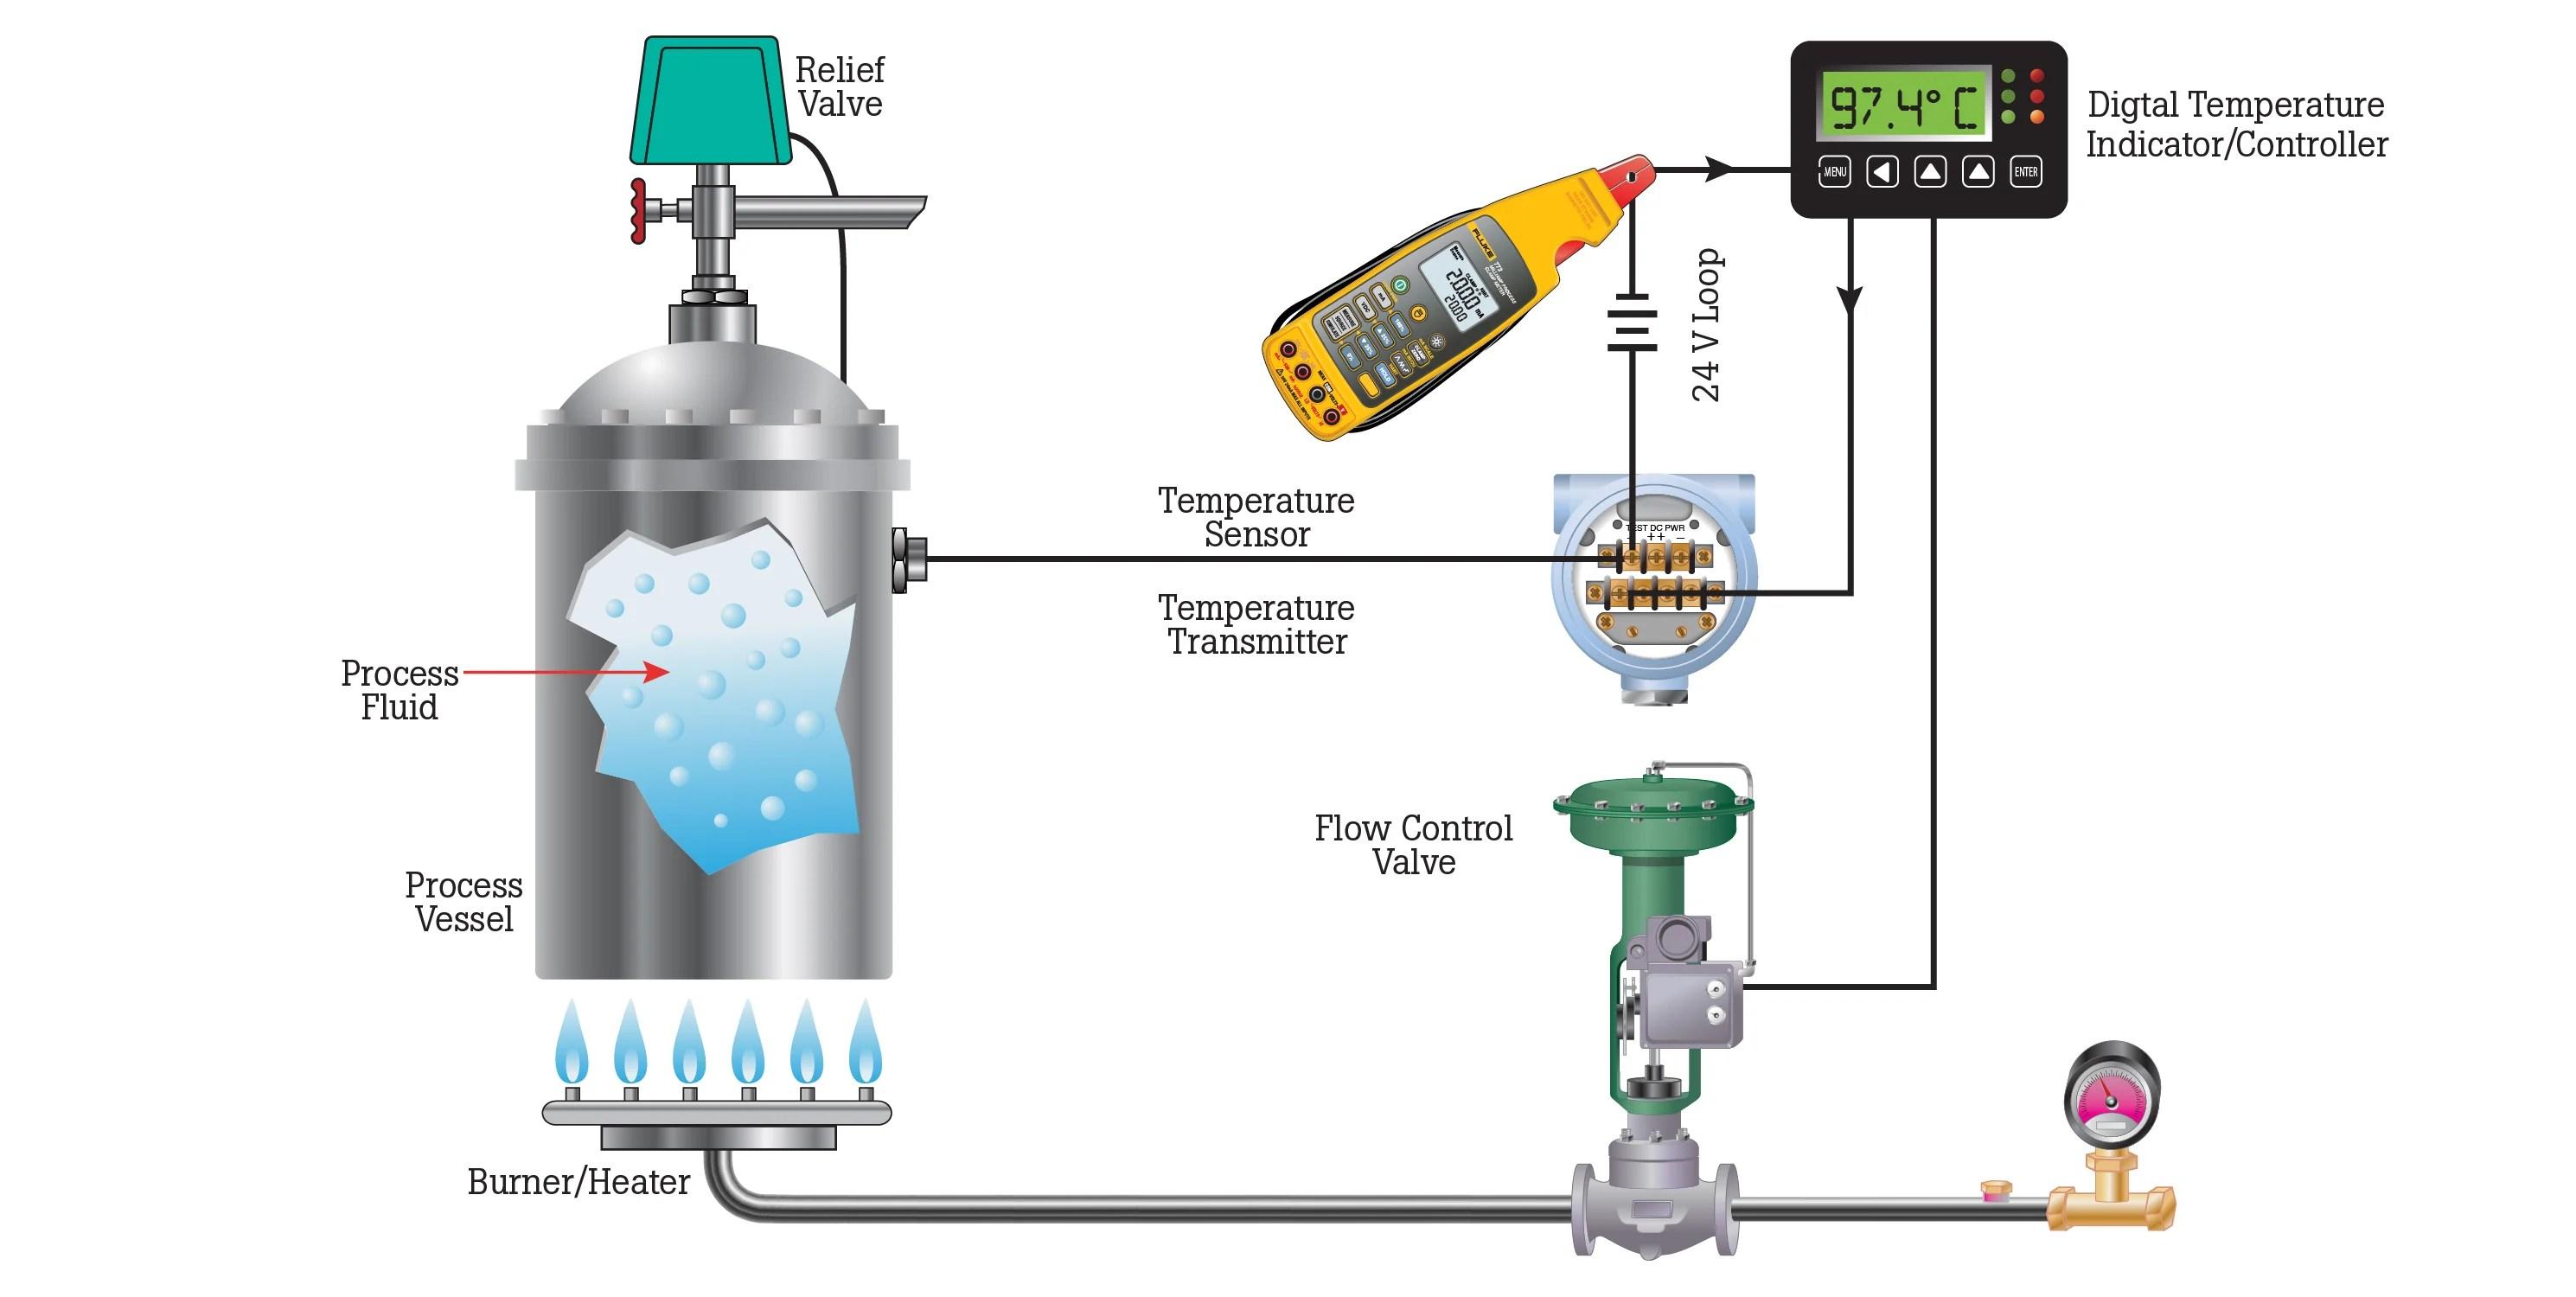 honeywell pressure transmitter wiring diagram bmw e36 m50 how to measure a 4 20ma loop signal fluke